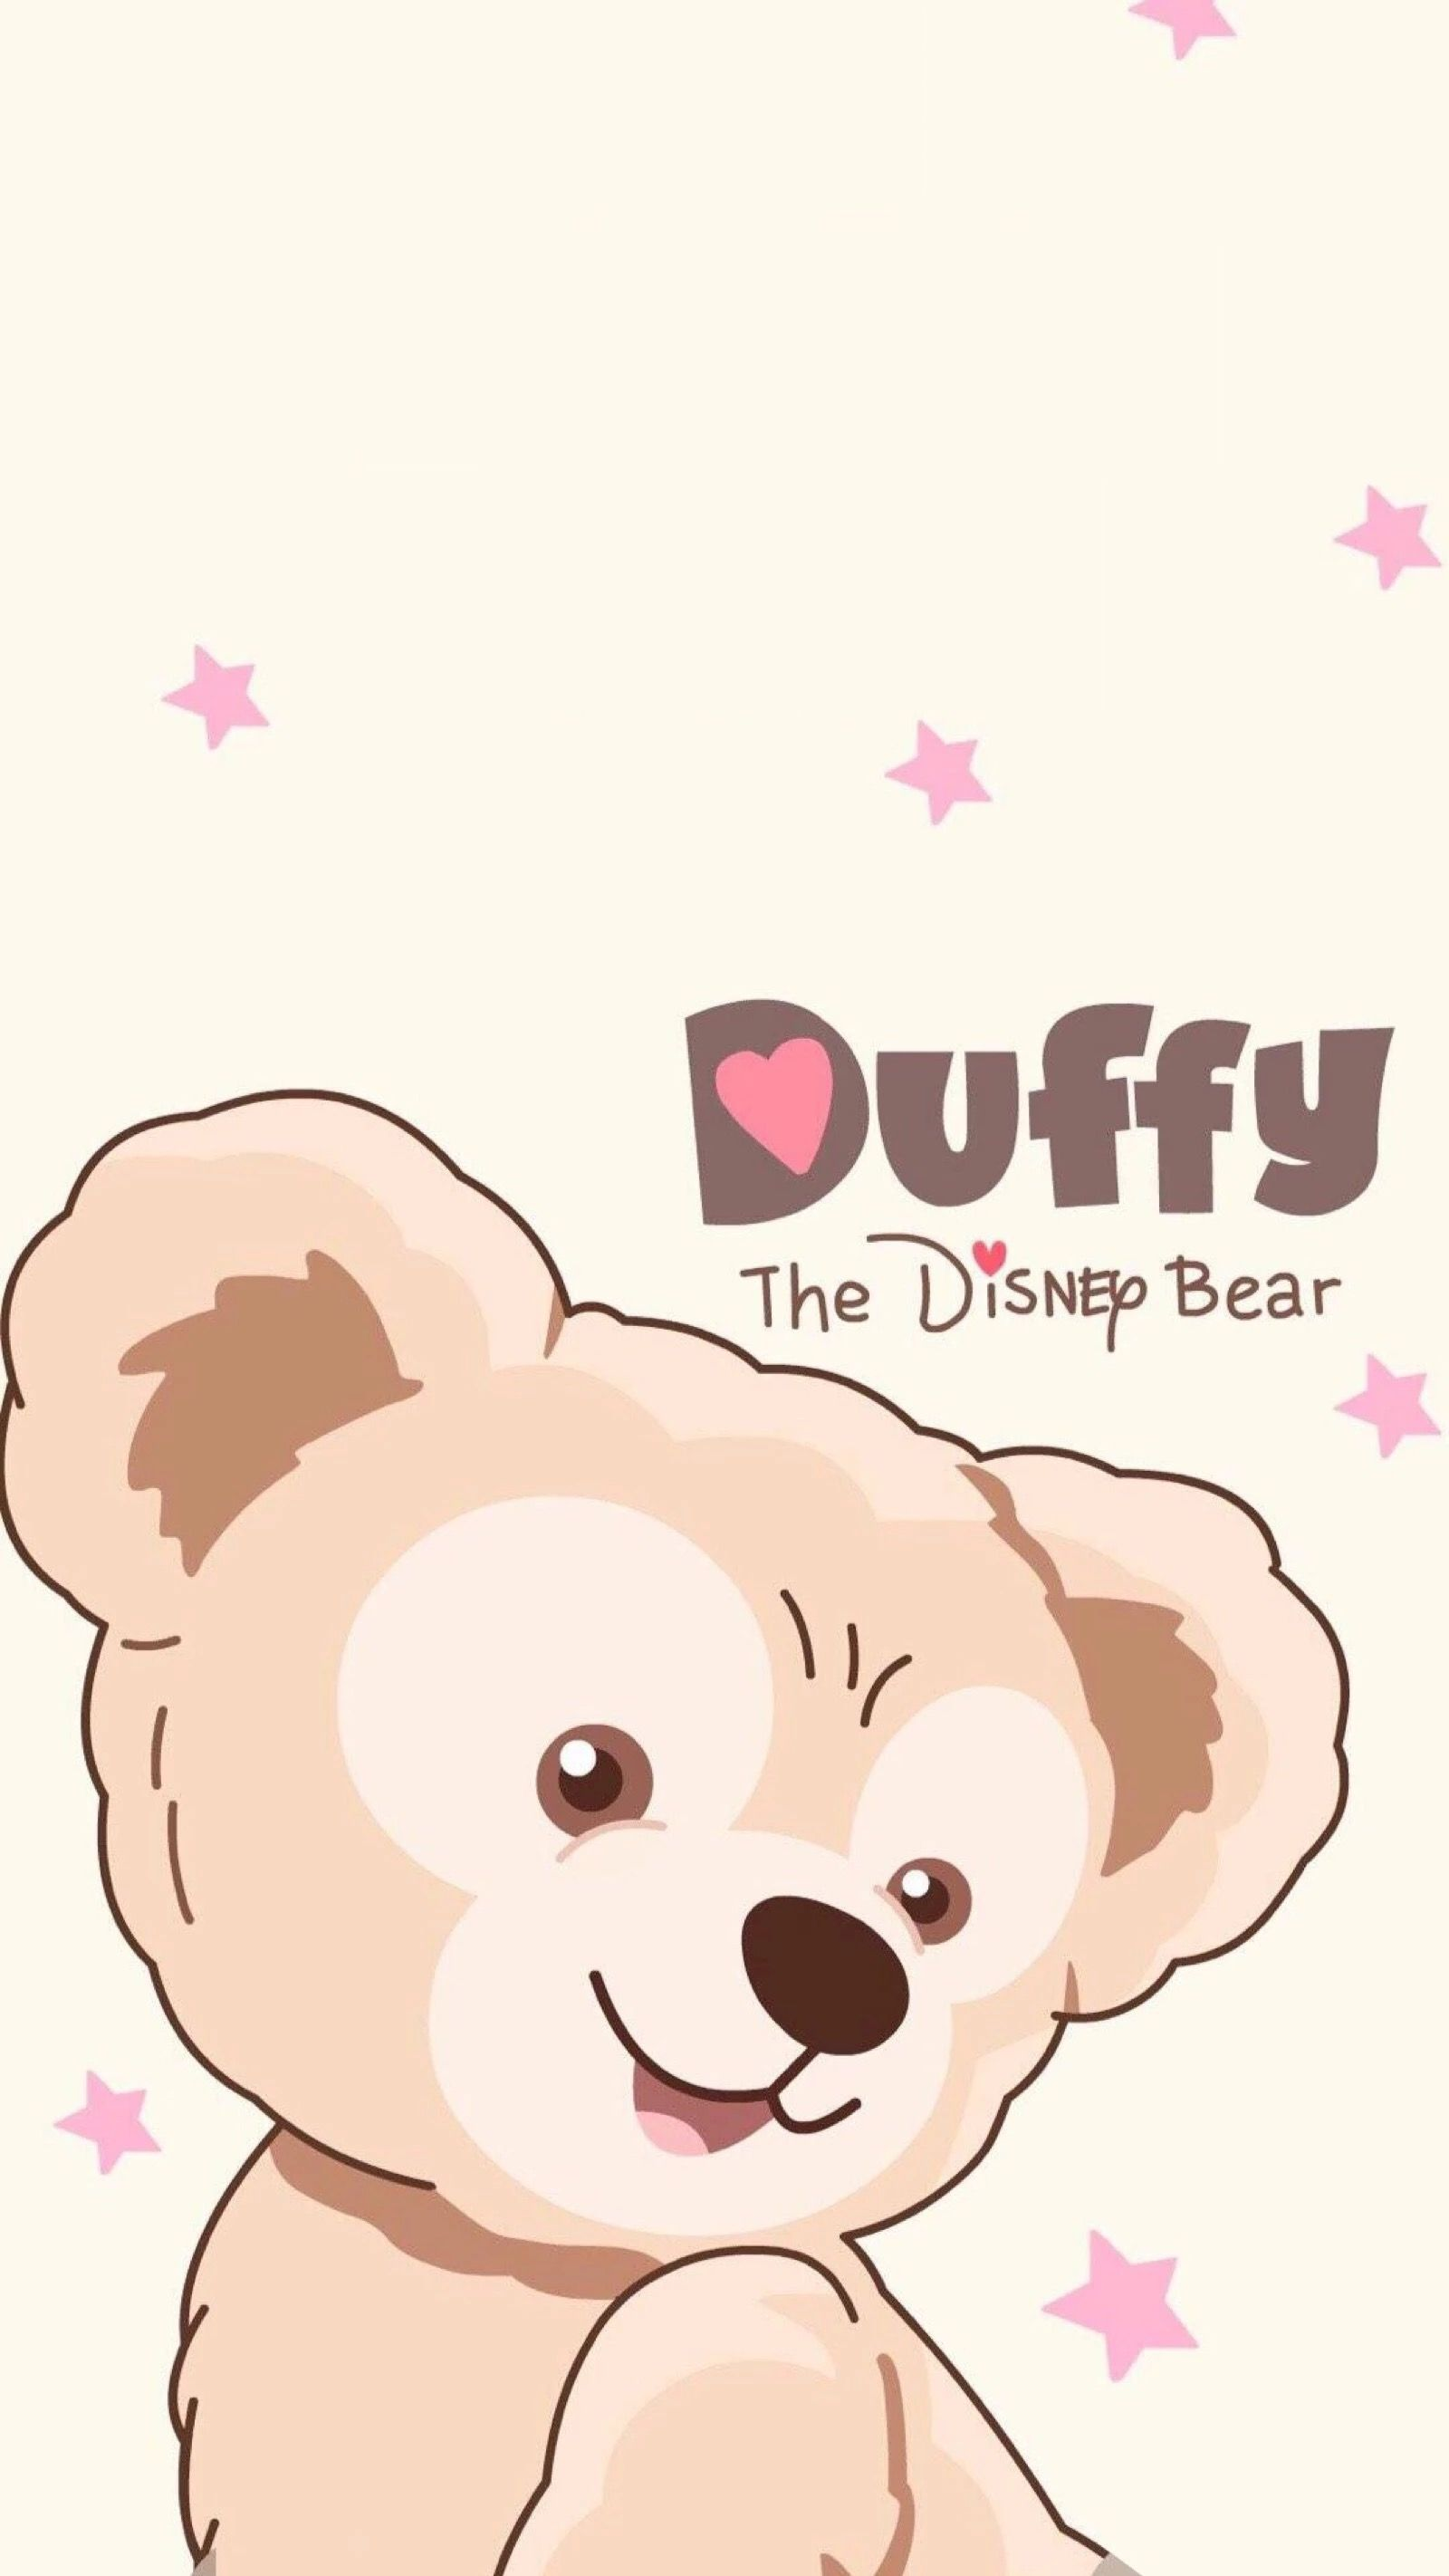 Wallpaper Disney おしゃれまとめの人気アイデア Pinterest 知子 藤本 ダッフィー 壁紙 ディズニー ジェラトーニ かわいい イラスト 手書き